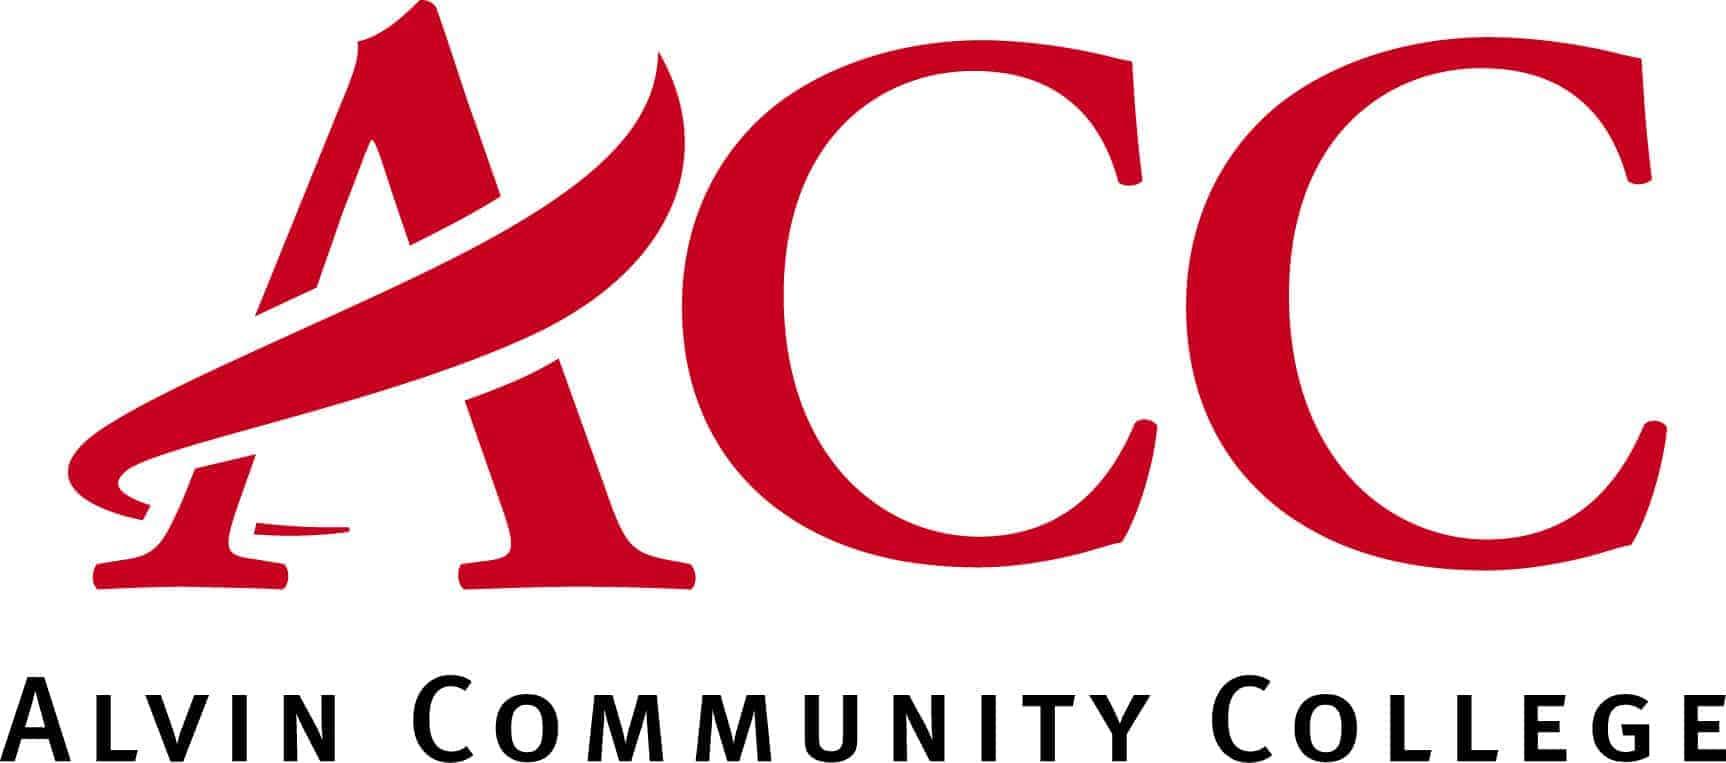 instructional services alvin community college logo 129673